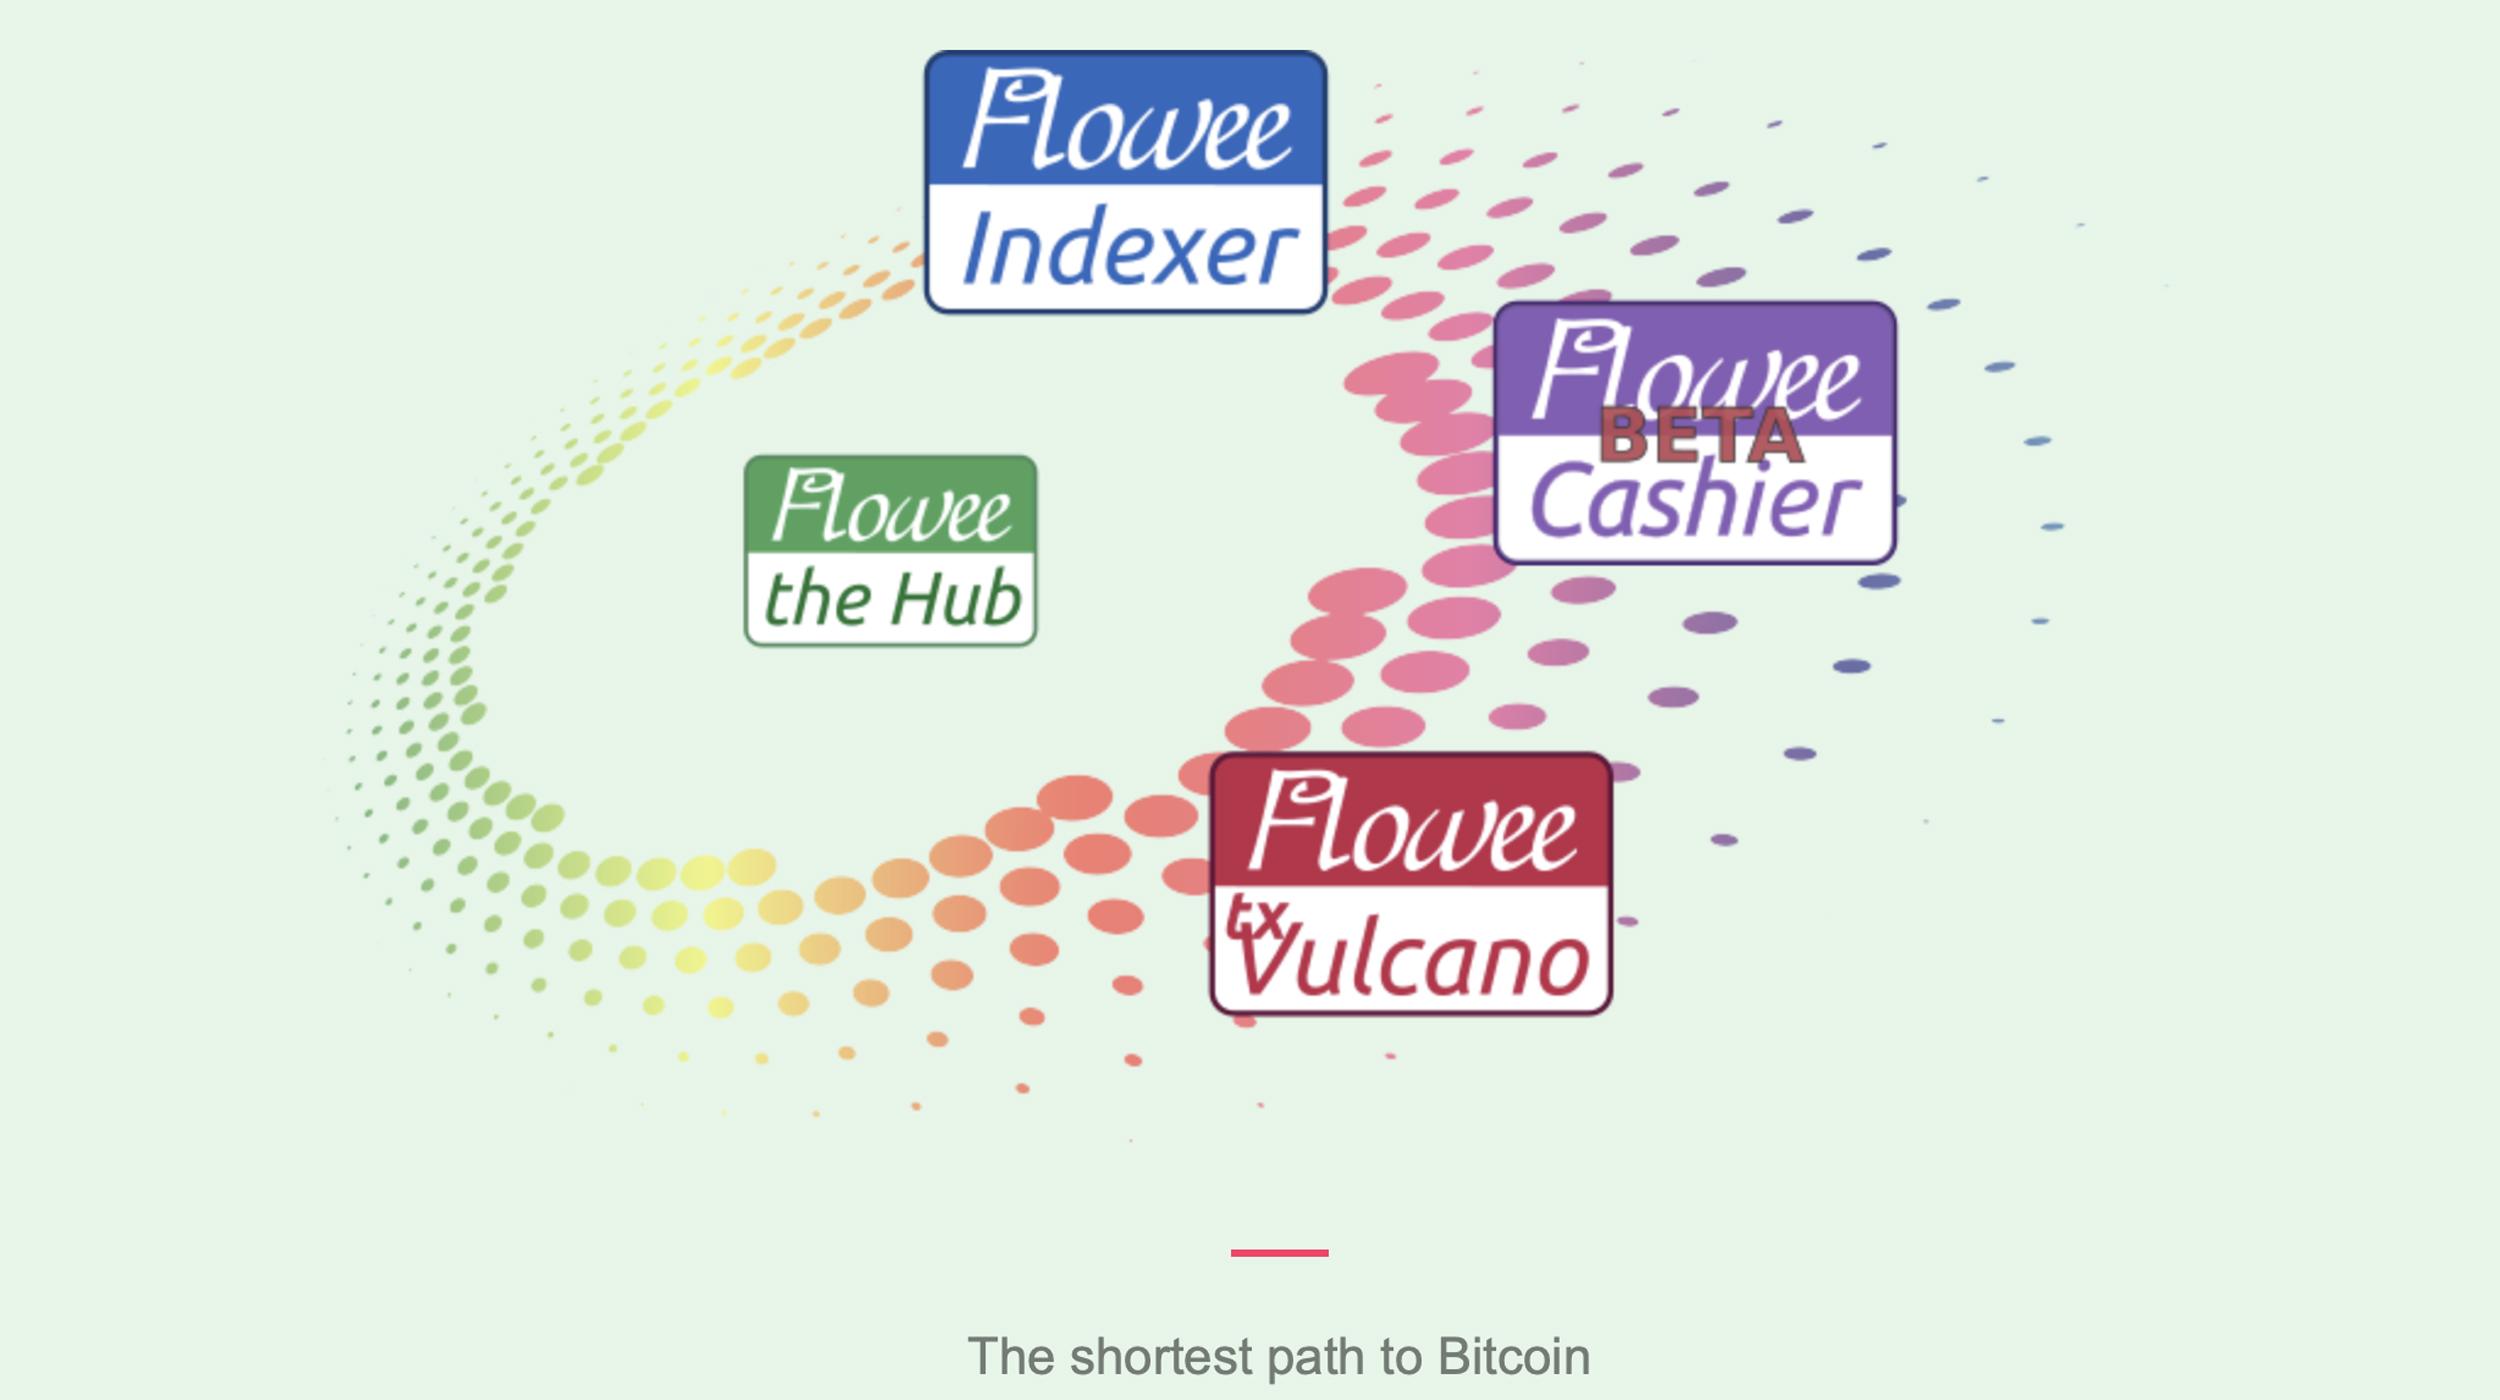 "Conozca a Flowee the Hub: un validador de Bitcoin Cash rico en funciones ""ancho = ""2500"" height = ""1400"" srcset = ""https://blackswanfinances.com/wp-content/uploads/2019/11/fourflowee.jpg 2500w, https://news.bitcoin.com/wp-content/ uploads / 2019/11 / fourflowee-300x168.jpg 300w, https://news.bitcoin.com/wp-content/uploads/2019/11/fourflowee-768x430.jpg 768w, https://news.bitcoin.com/ wp-content / uploads / 2019/11 / fourflowee-1024x573.jpg 1024w, https://news.bitcoin.com/wp-content/uploads/2019/11/fourflowee-696x390.jpg 696w, https: // noticias. bitcoin.com/wp-content/uploads/2019/11/fourflowee-1392x780.jpg 1392w, https://news.bitcoin.com/wp-content/uploads/2019/11/fourflowee-1068x598.jpg 1068w, https: //news.bitcoin.com/wp-content/uploads/2019/11/fourflowee-750x420.jpg 750w ""tamaños ="" (ancho máximo: 2500px) 100vw, 2500px"